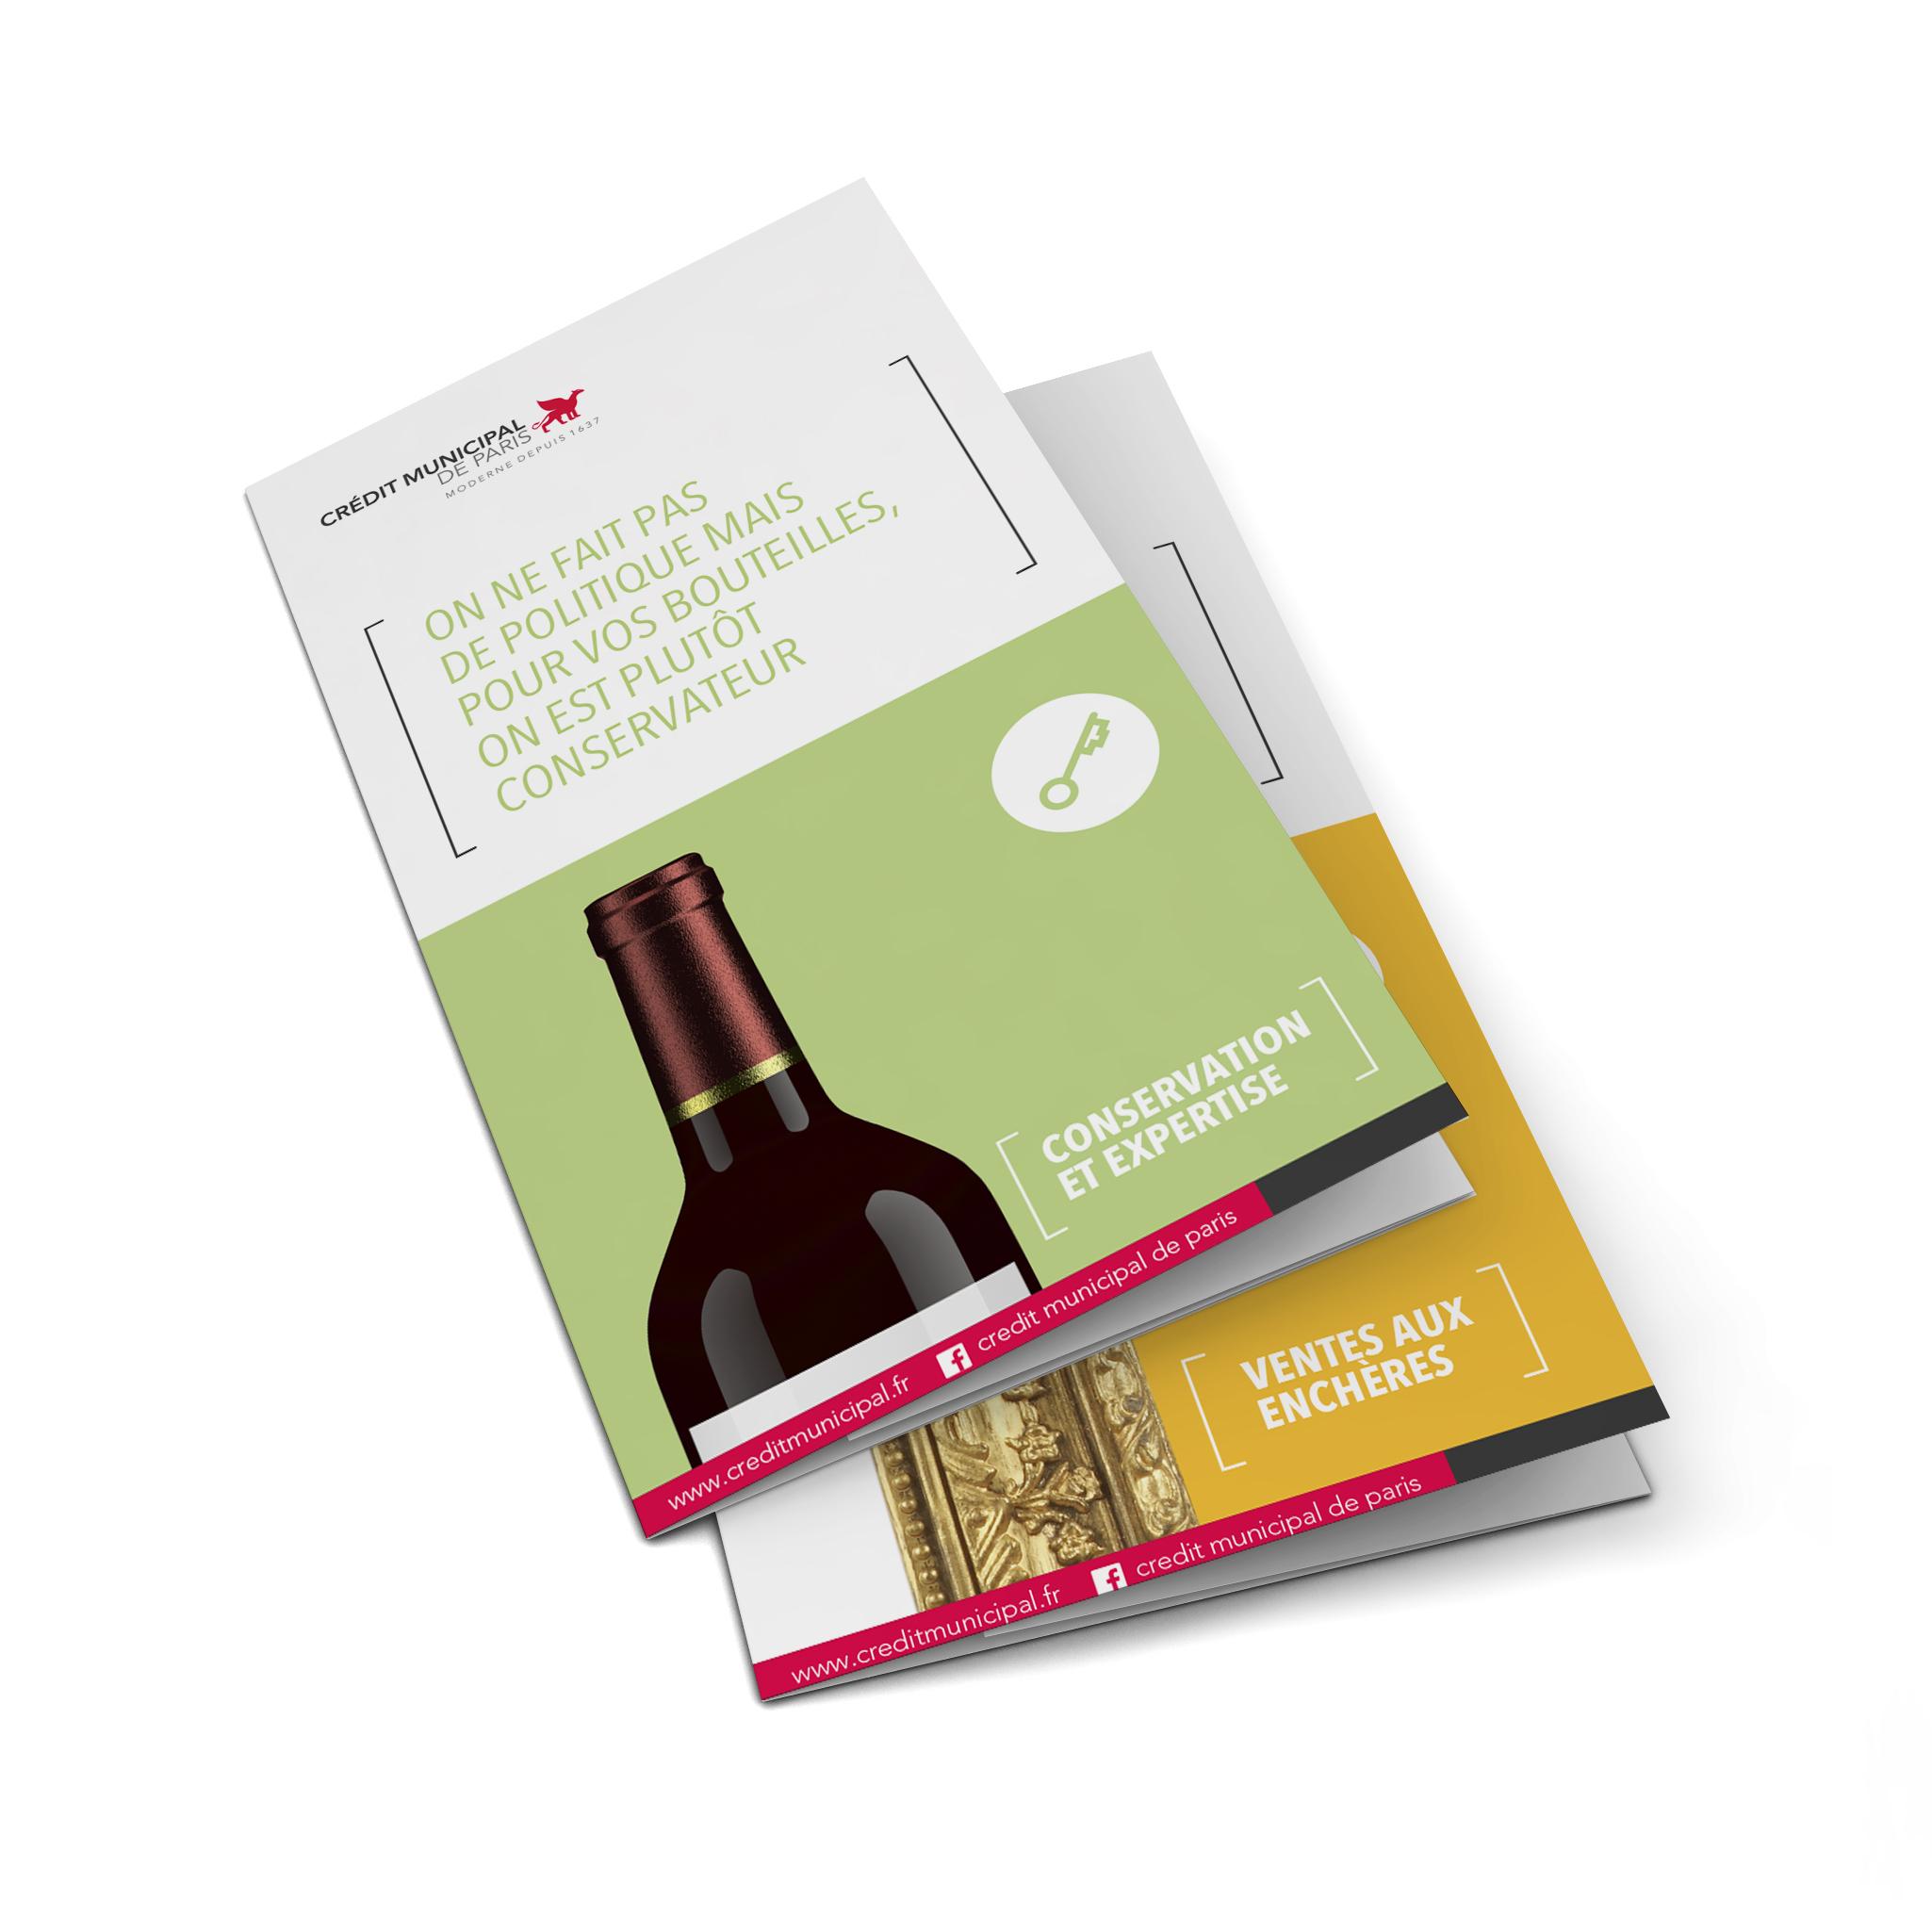 Blank leaflet. 3d illustration isolated on white background ; Shutterstock ID 214726384